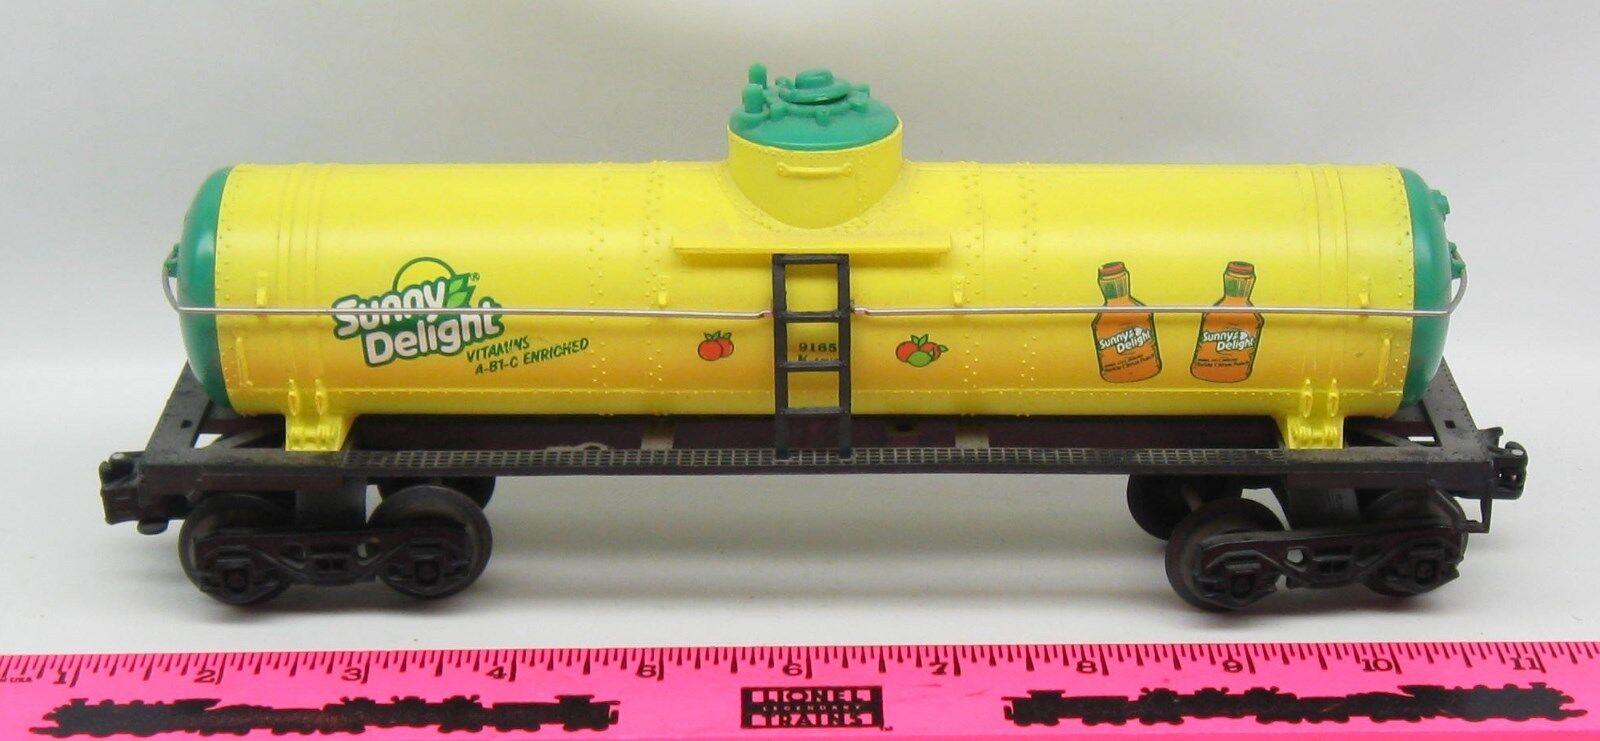 K-Line K-9165 Sunny Delight tank